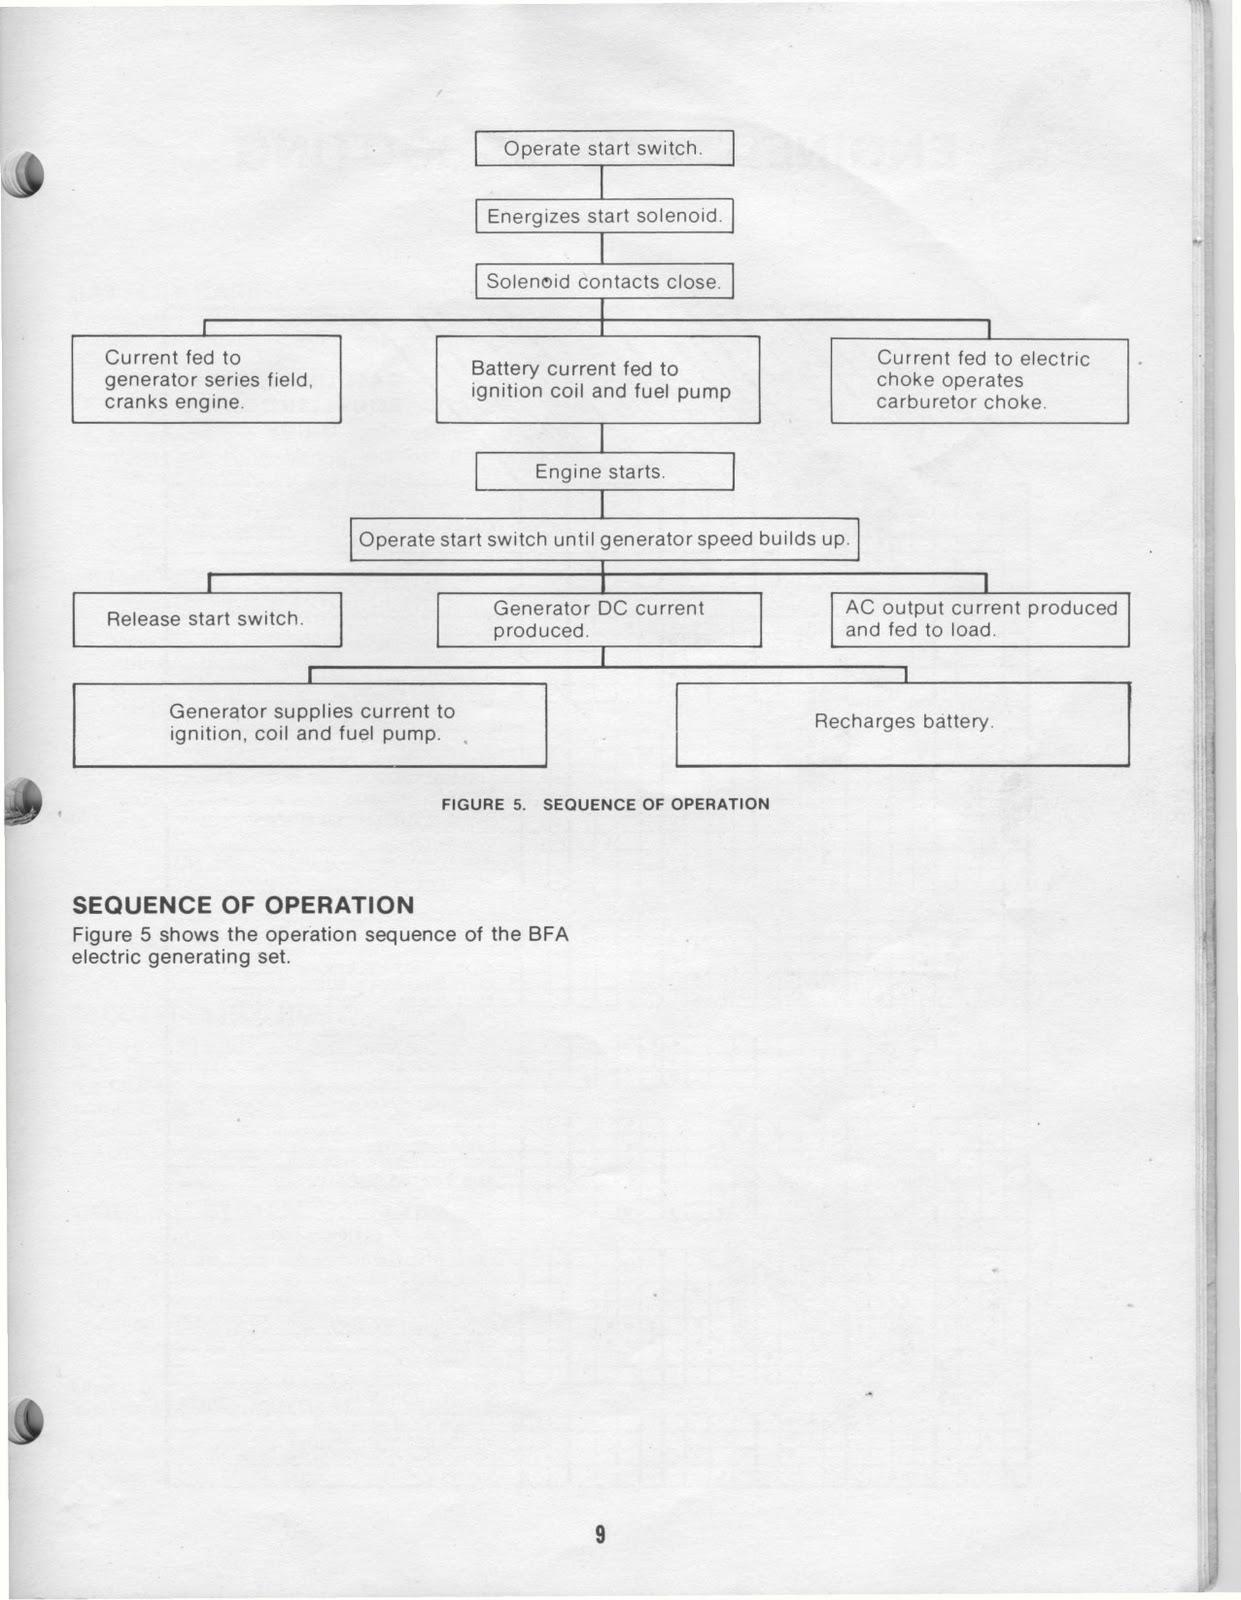 hight resolution of wiring diagram onan generator wiring image 1983 fleetwood pace arrow owners manuals onan 4 0 kw